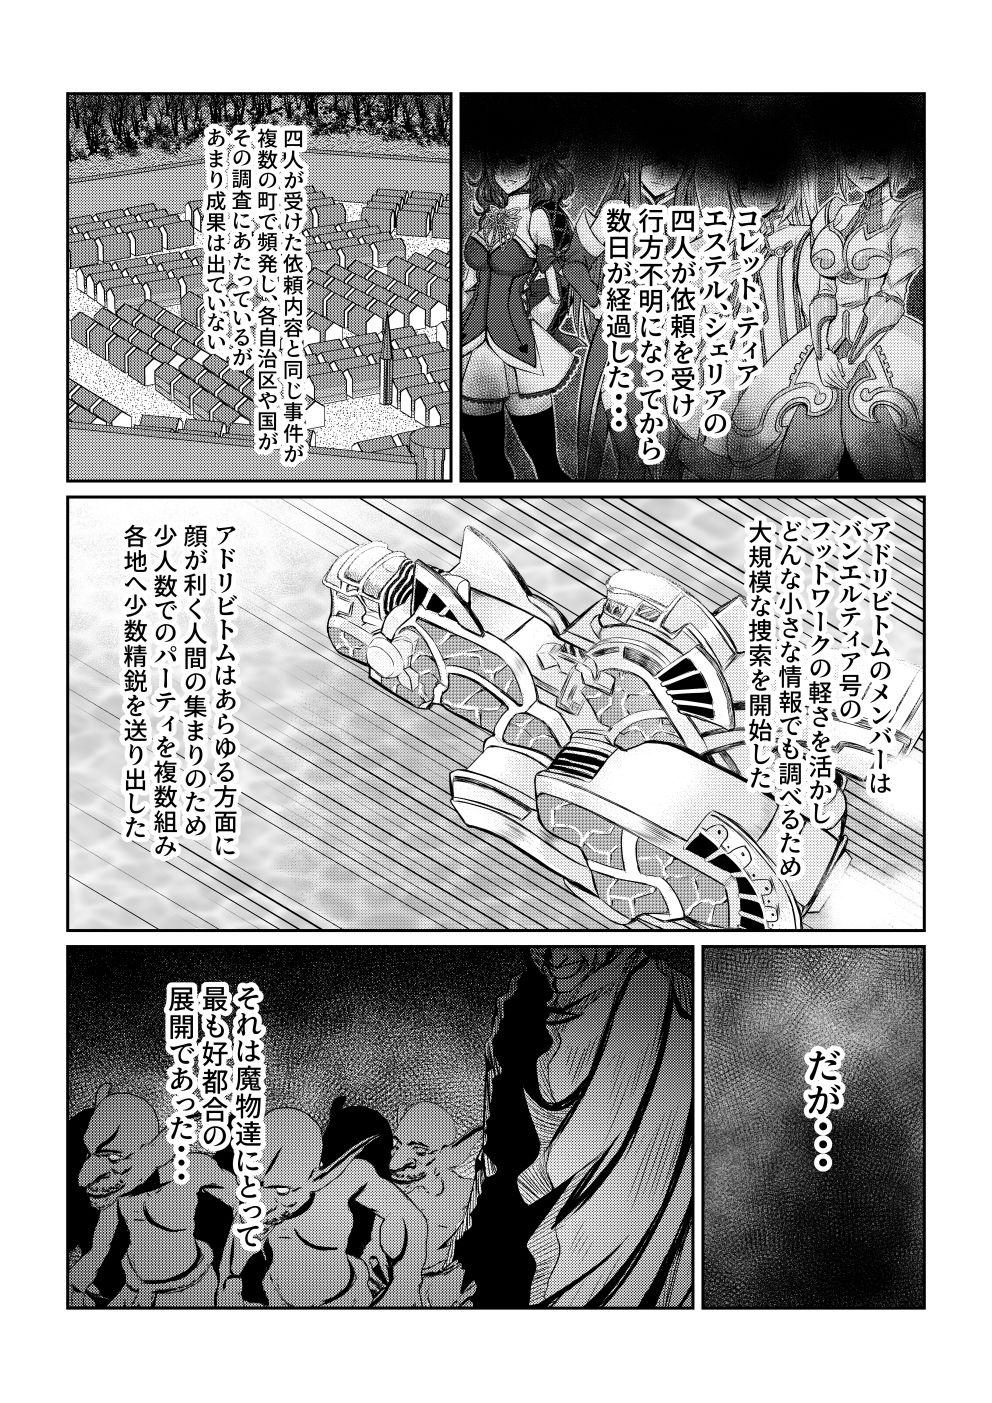 Tales Of DarkSide〜堕ちゆく少女たち〜